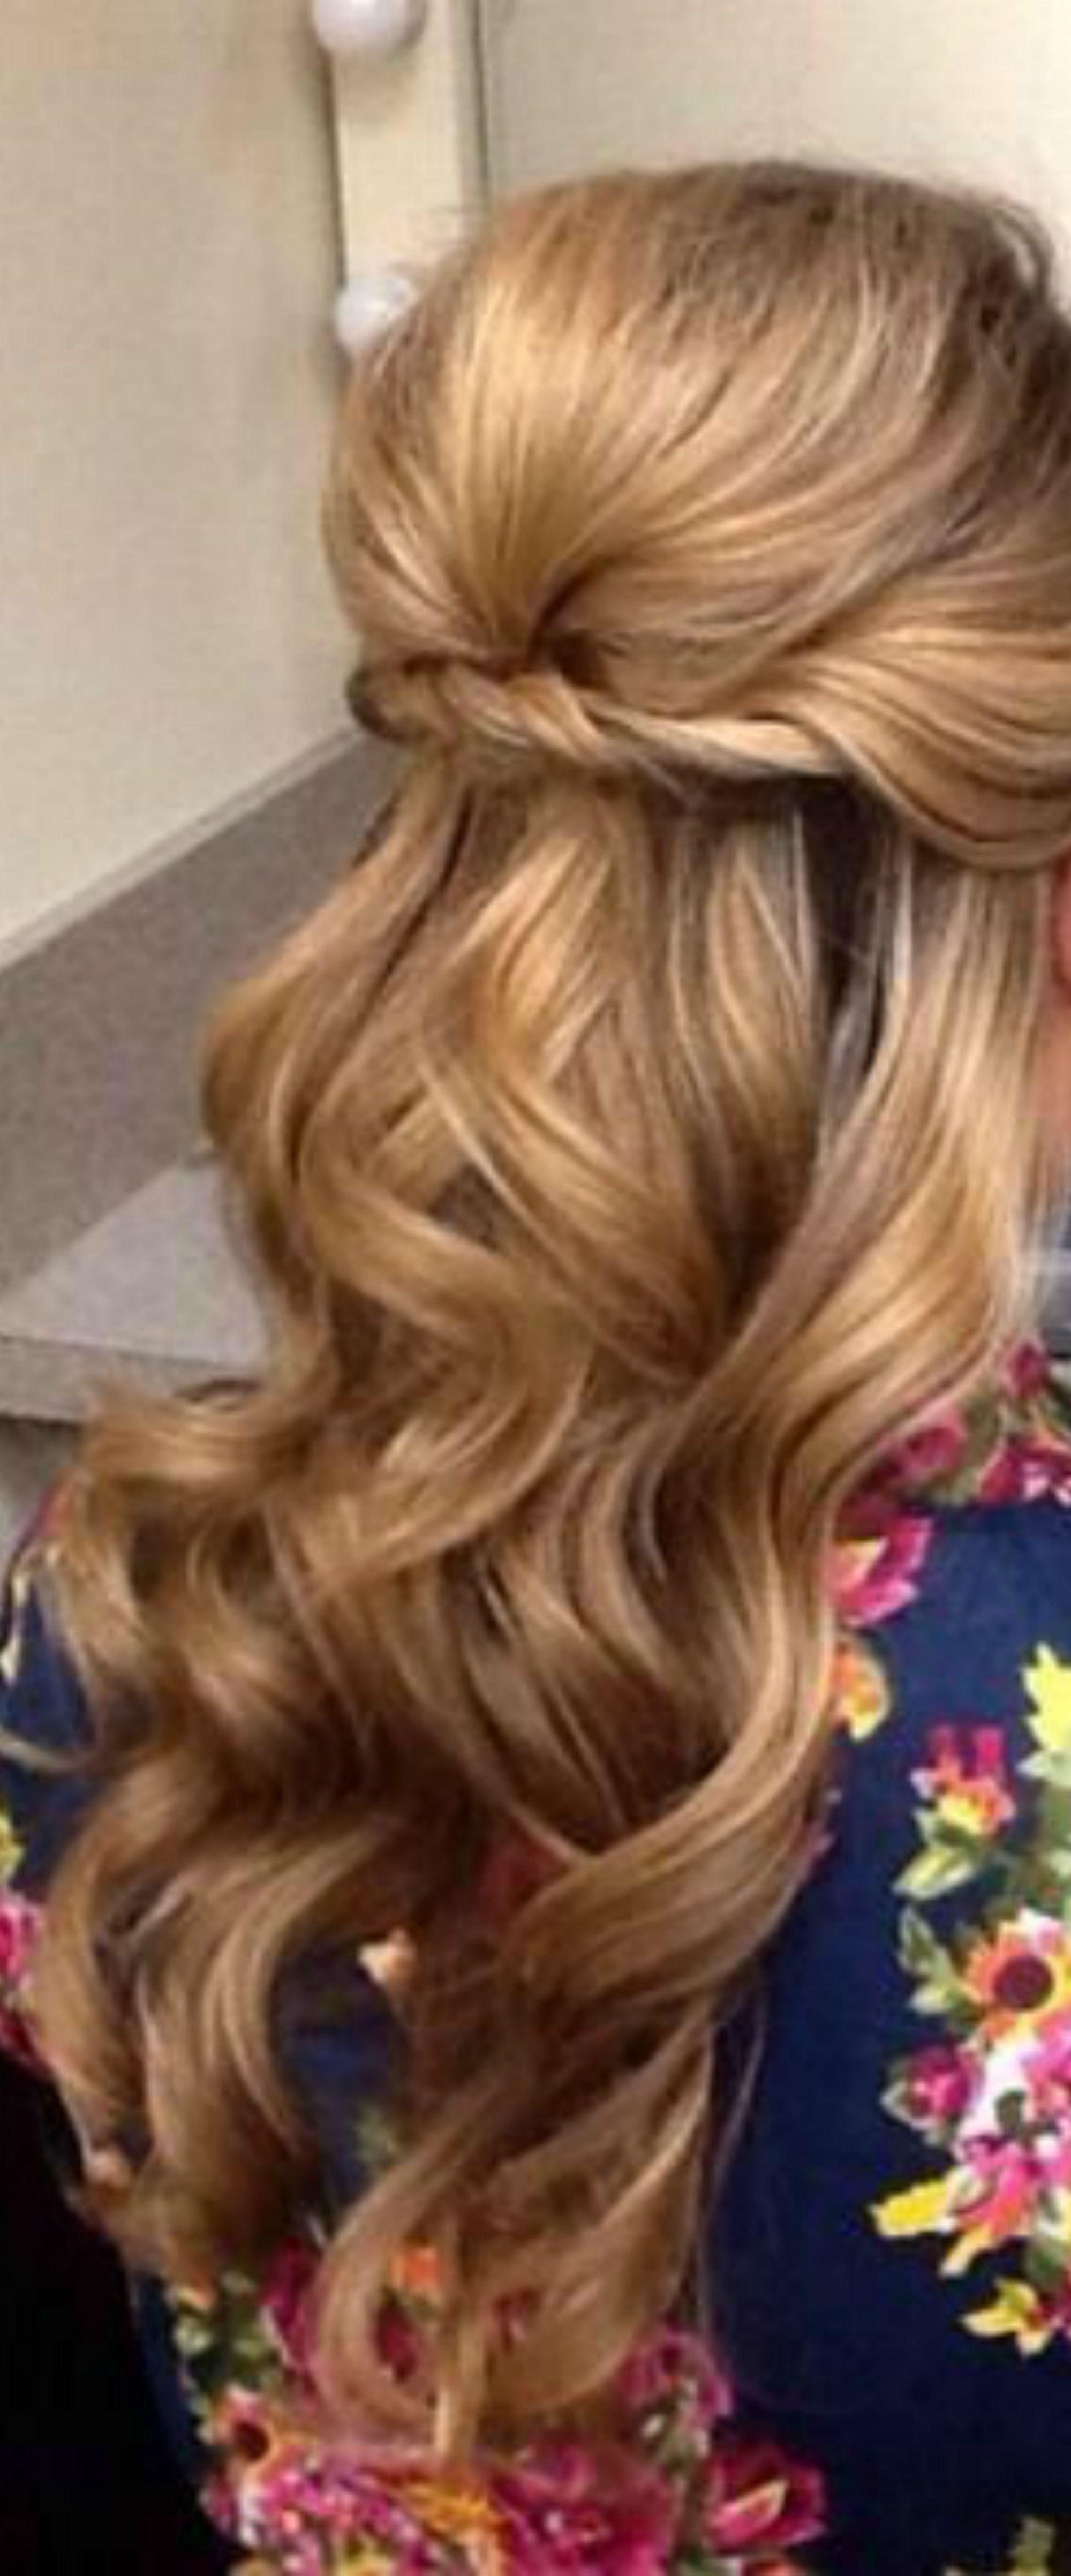 Pin By Brittney Lampinen On Future Wedding Bells Pinterest Hair